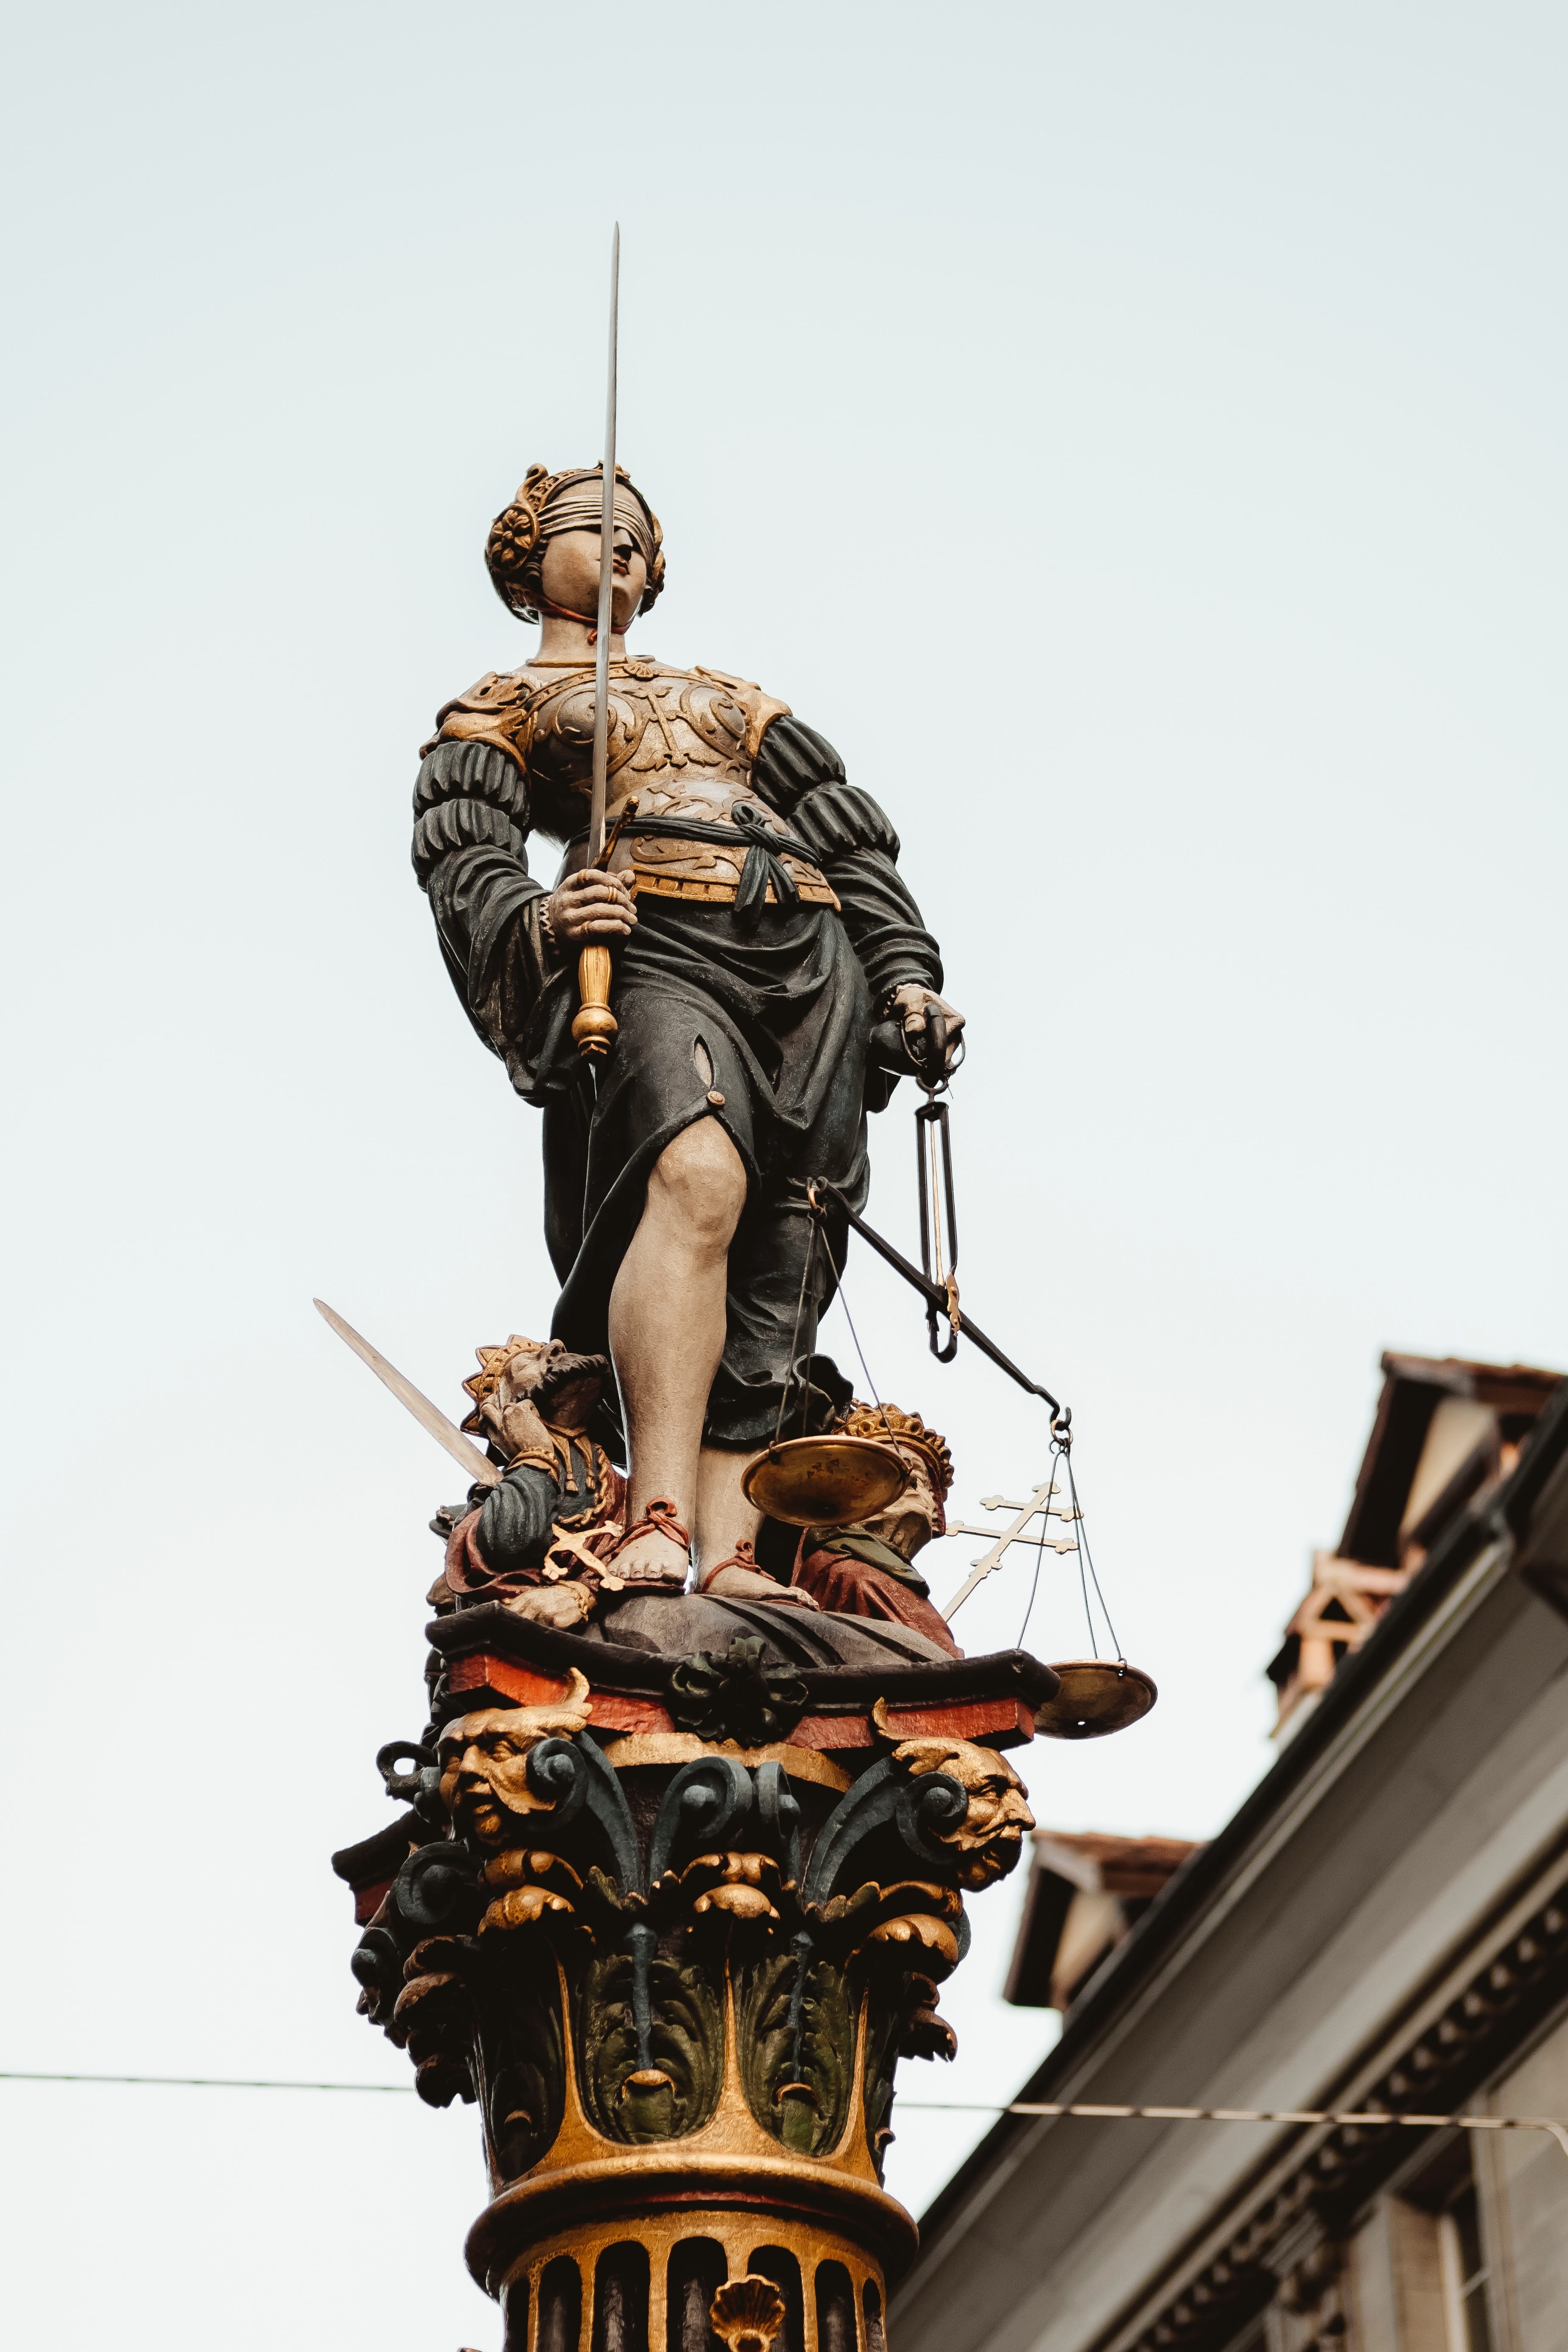 Statue of Lady Justice; image by Joel & Jasmin Førestbird, via Unsplash.com.